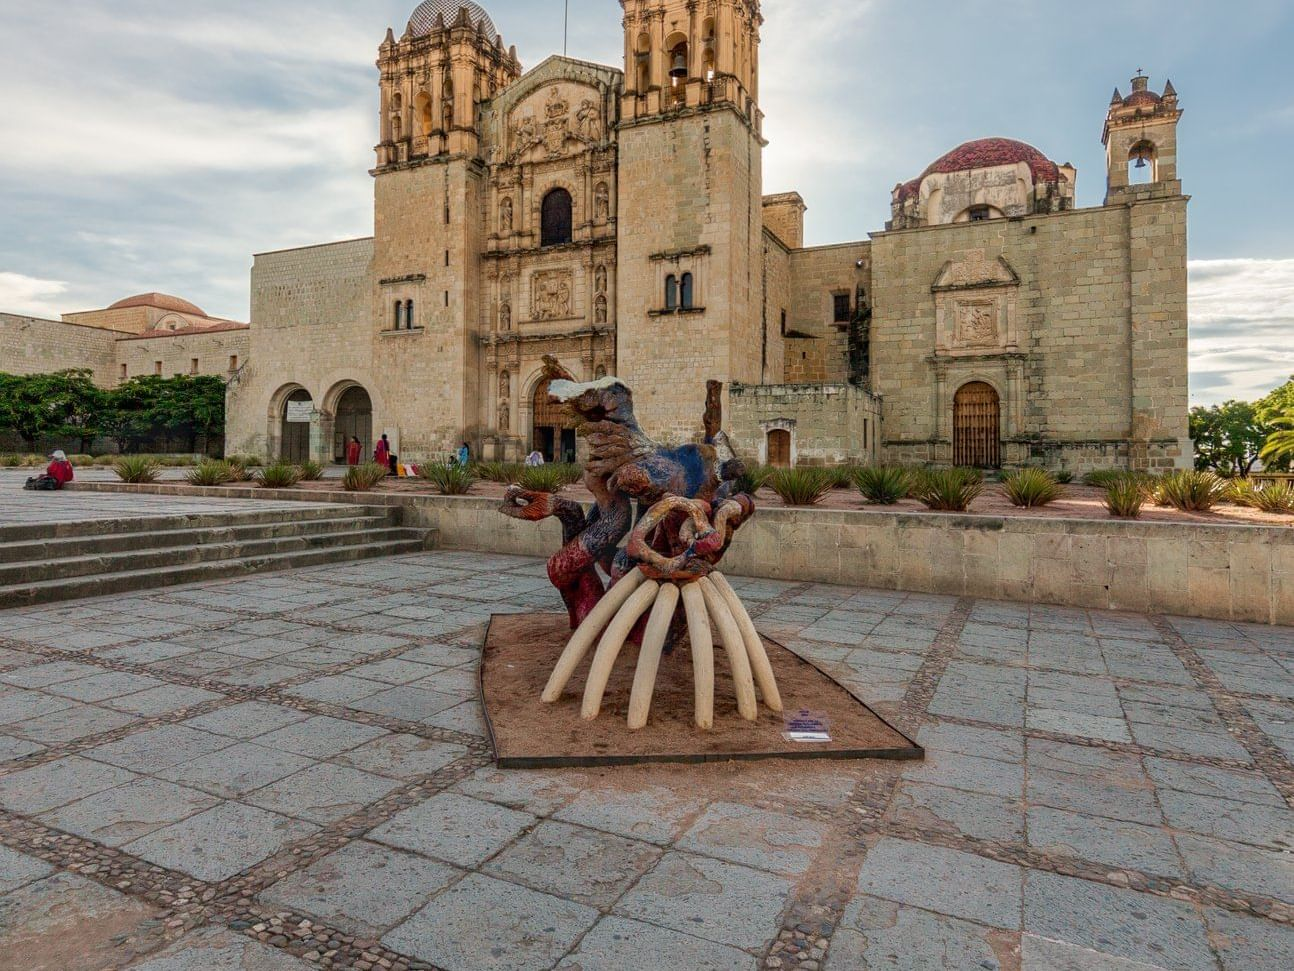 Statue in the Main plaza in the Oaxaca city